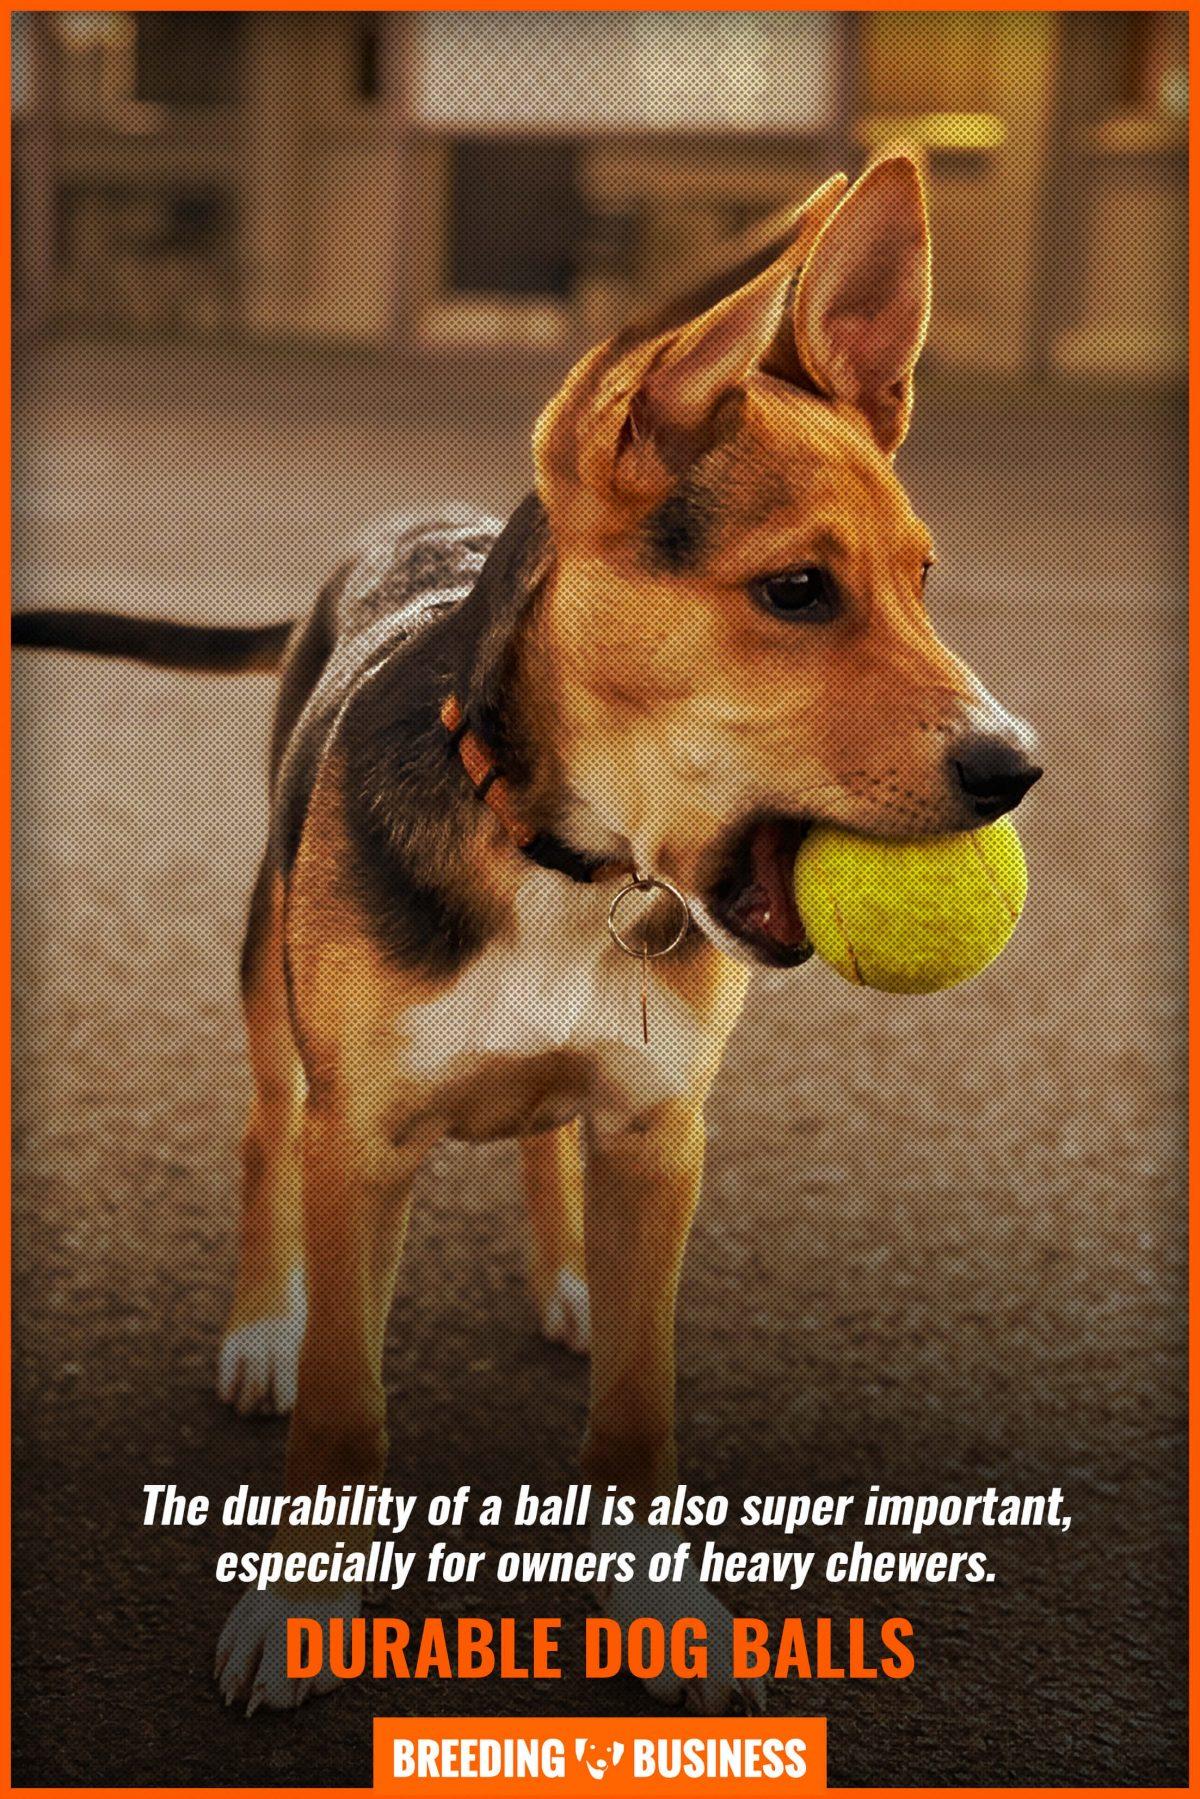 durable dog balls